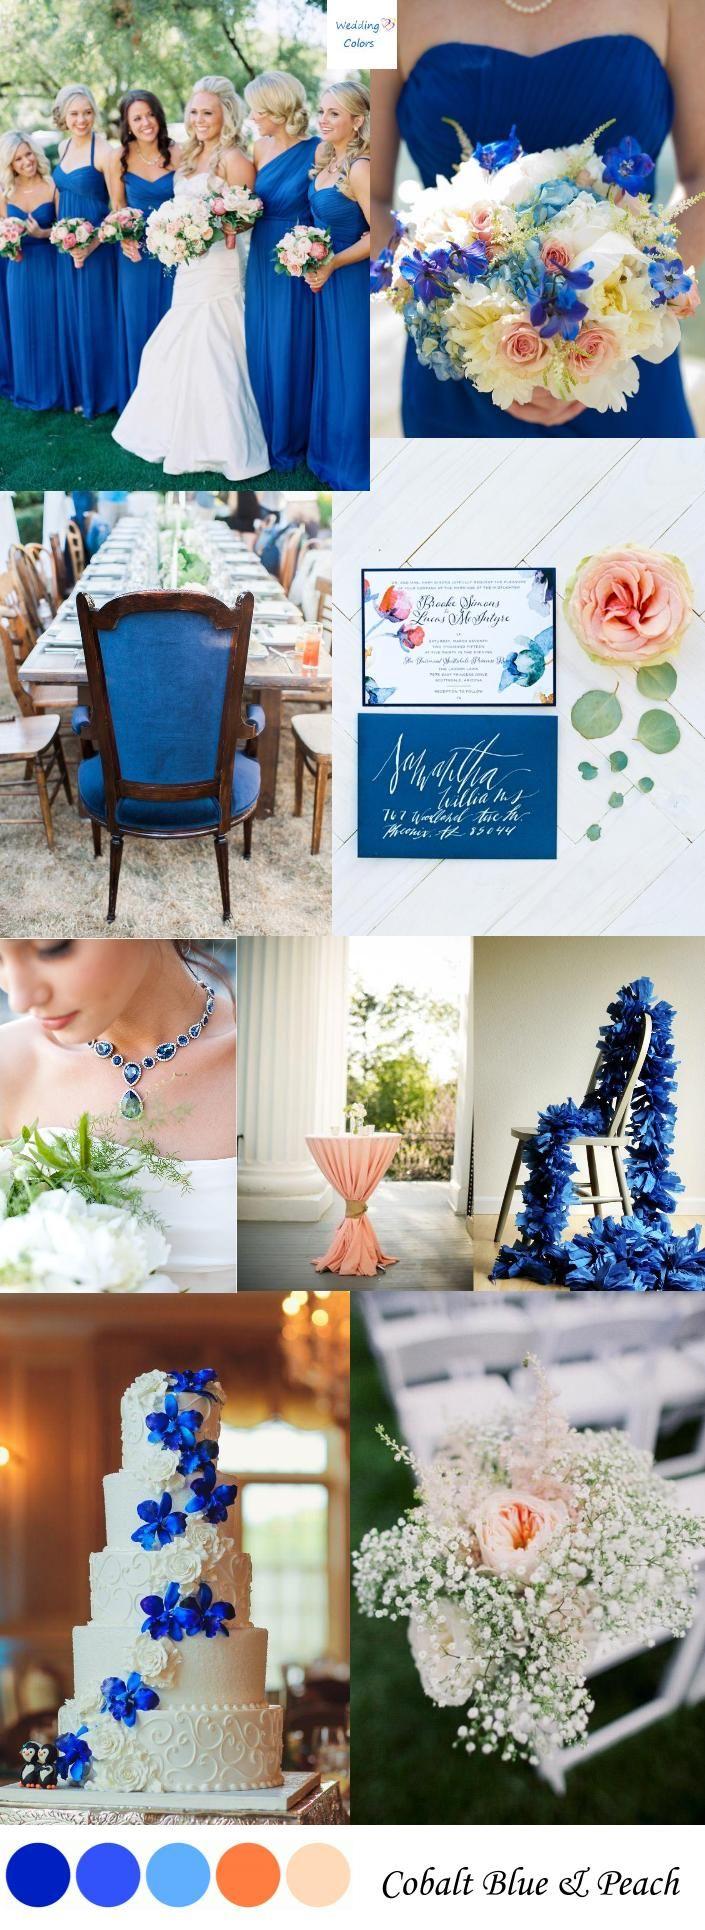 10 best ideas about Cobalt Blue Weddings on Pinterest  Royal blue weddings Royal blue color